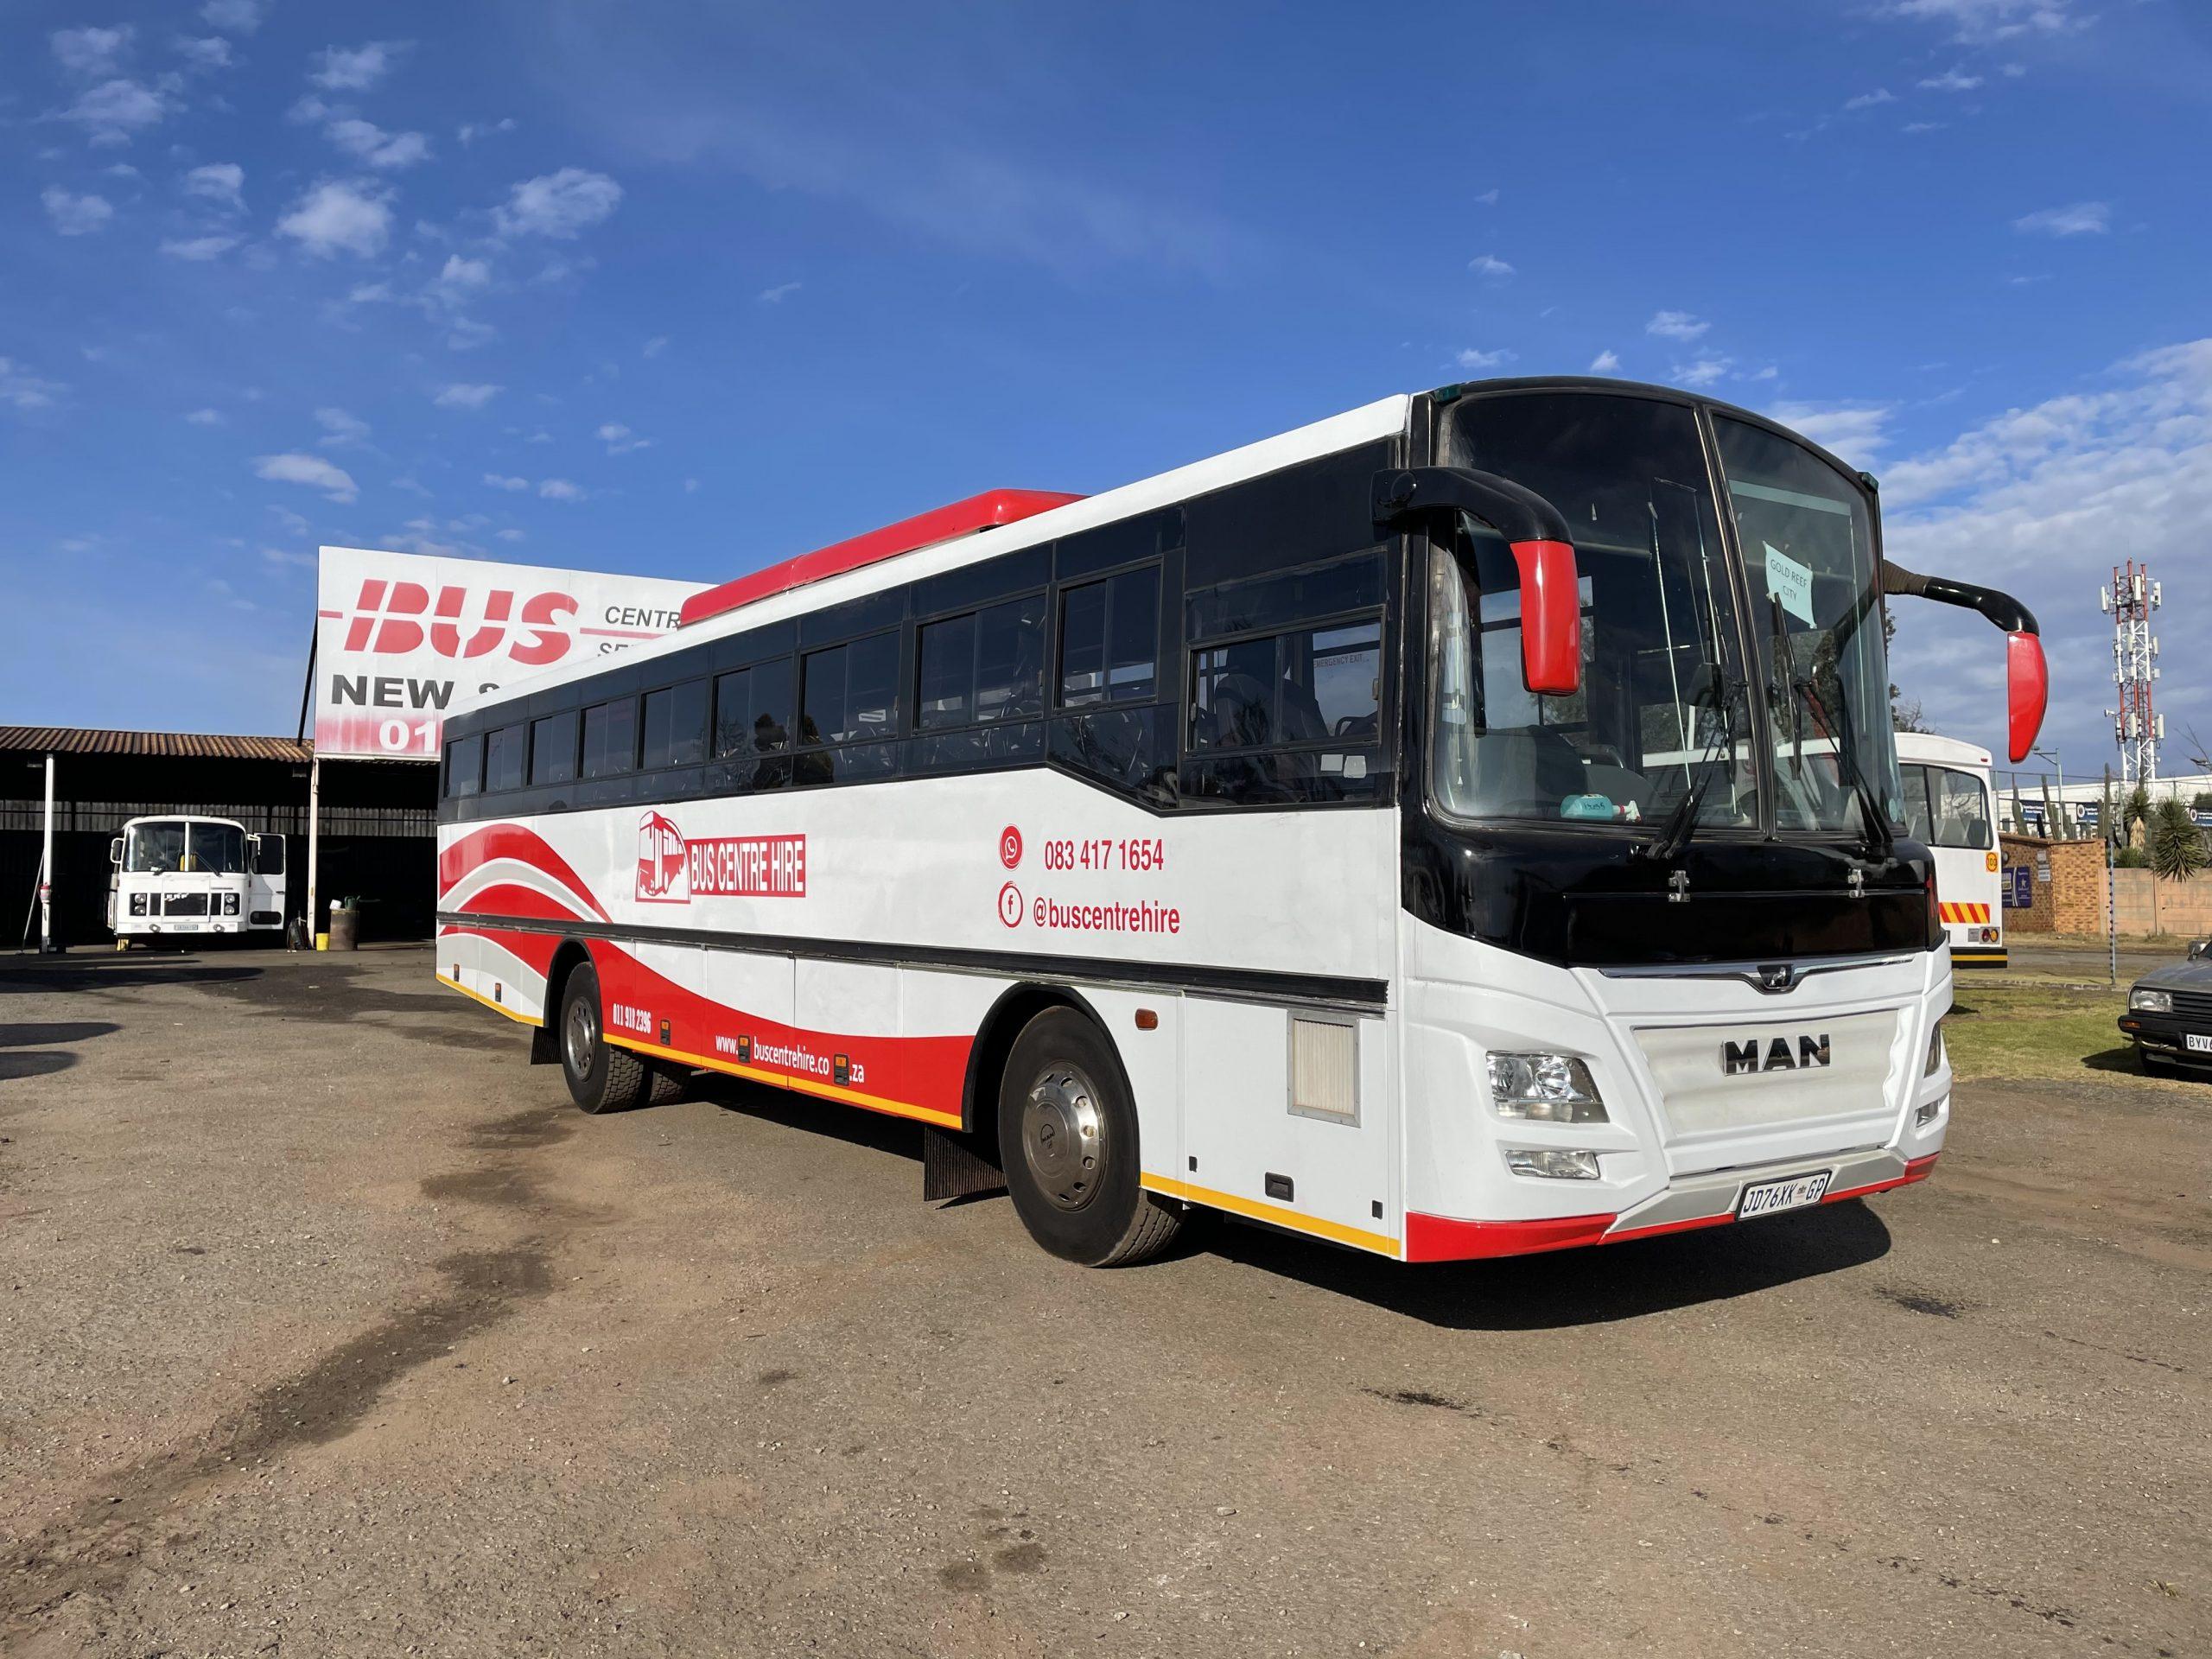 Bus Hire / Transport Rental Services